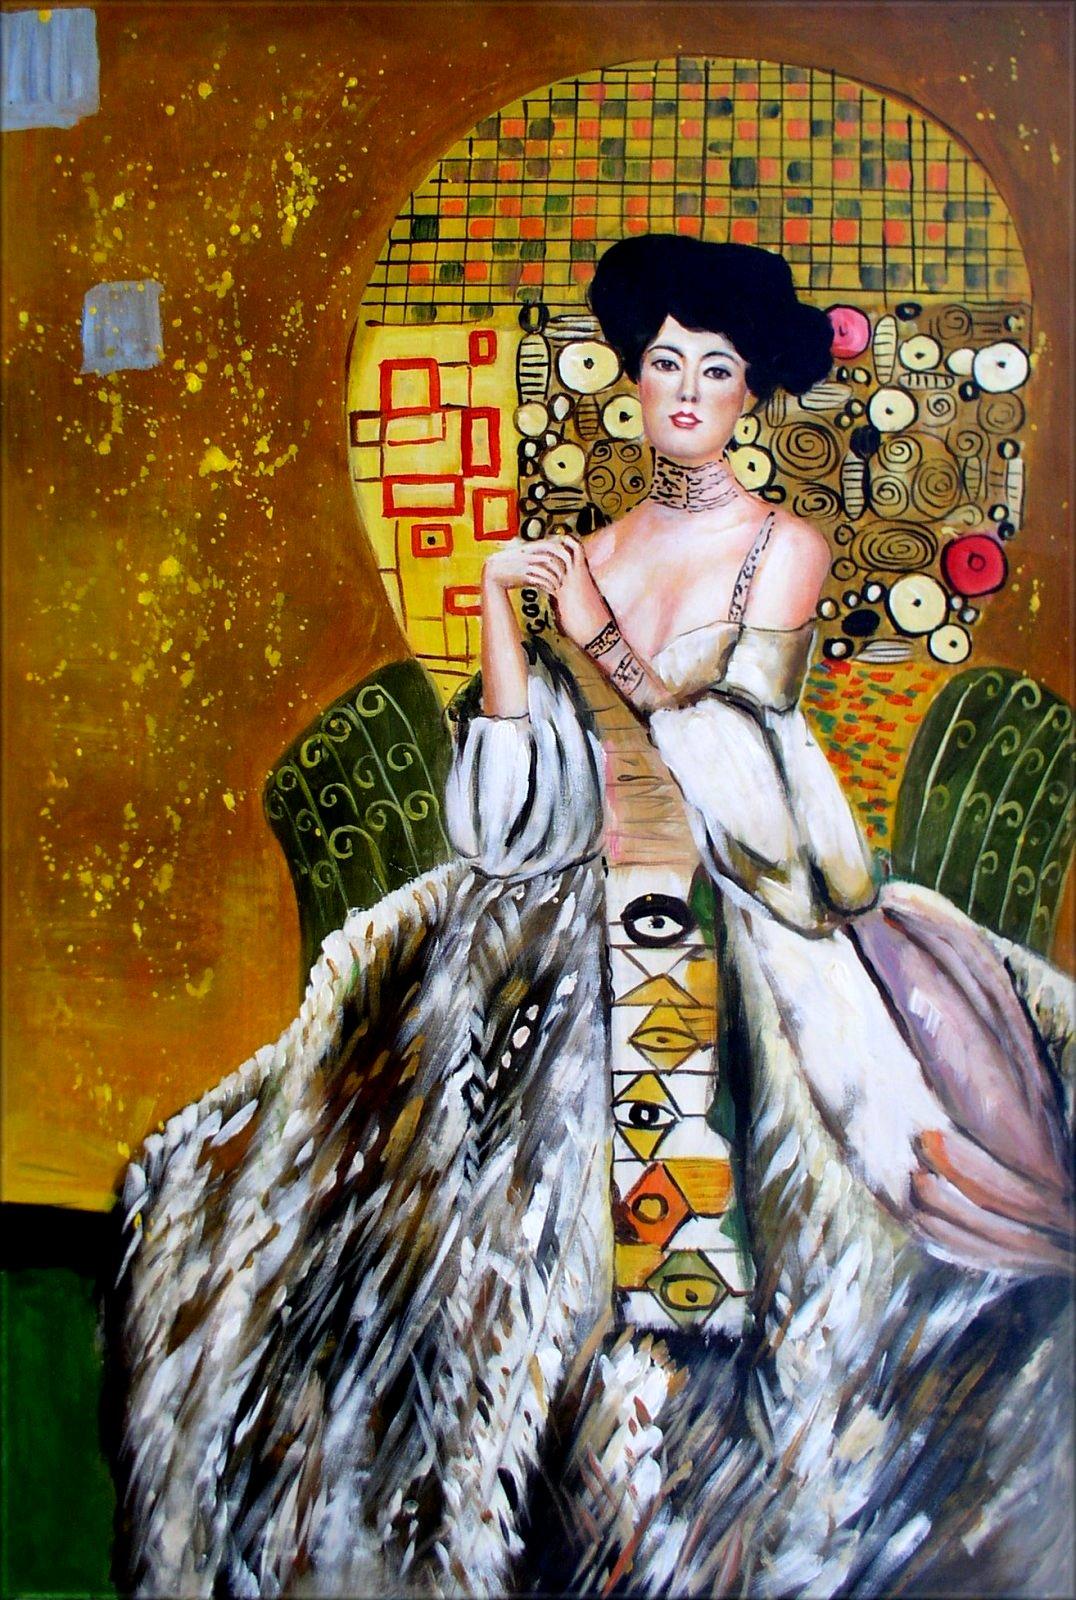 gustav klimt adele bloch bauer repro hand painted oil painting 24x36in ebay. Black Bedroom Furniture Sets. Home Design Ideas